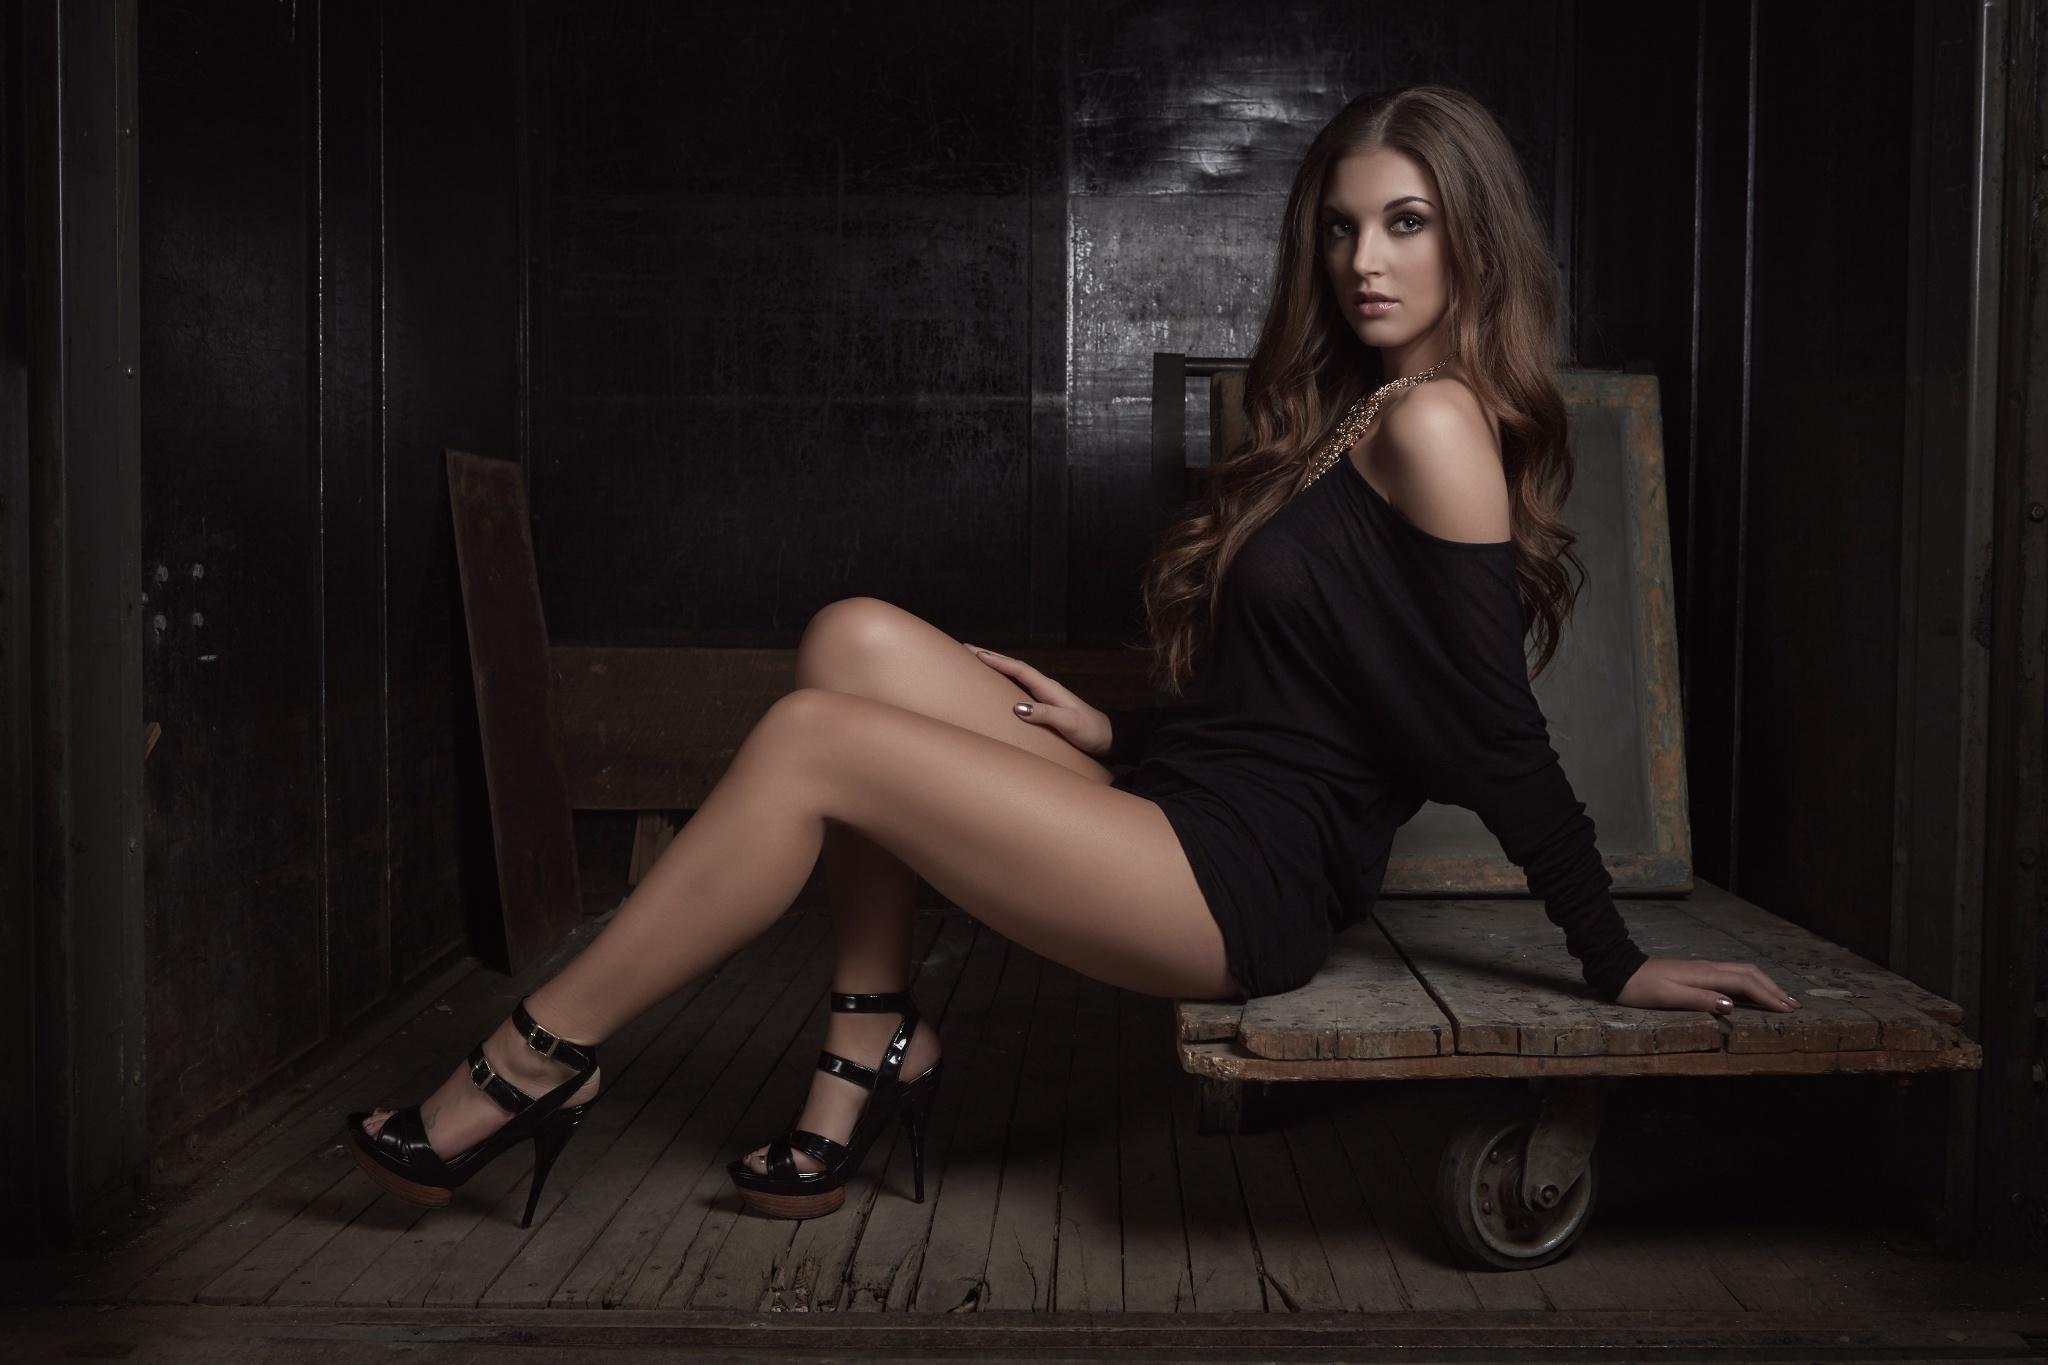 Women Model Brunette Long Hair High Heels Black Dress Bare Shoulders Sitting Wooden Surface Legs Loo 2048x1365